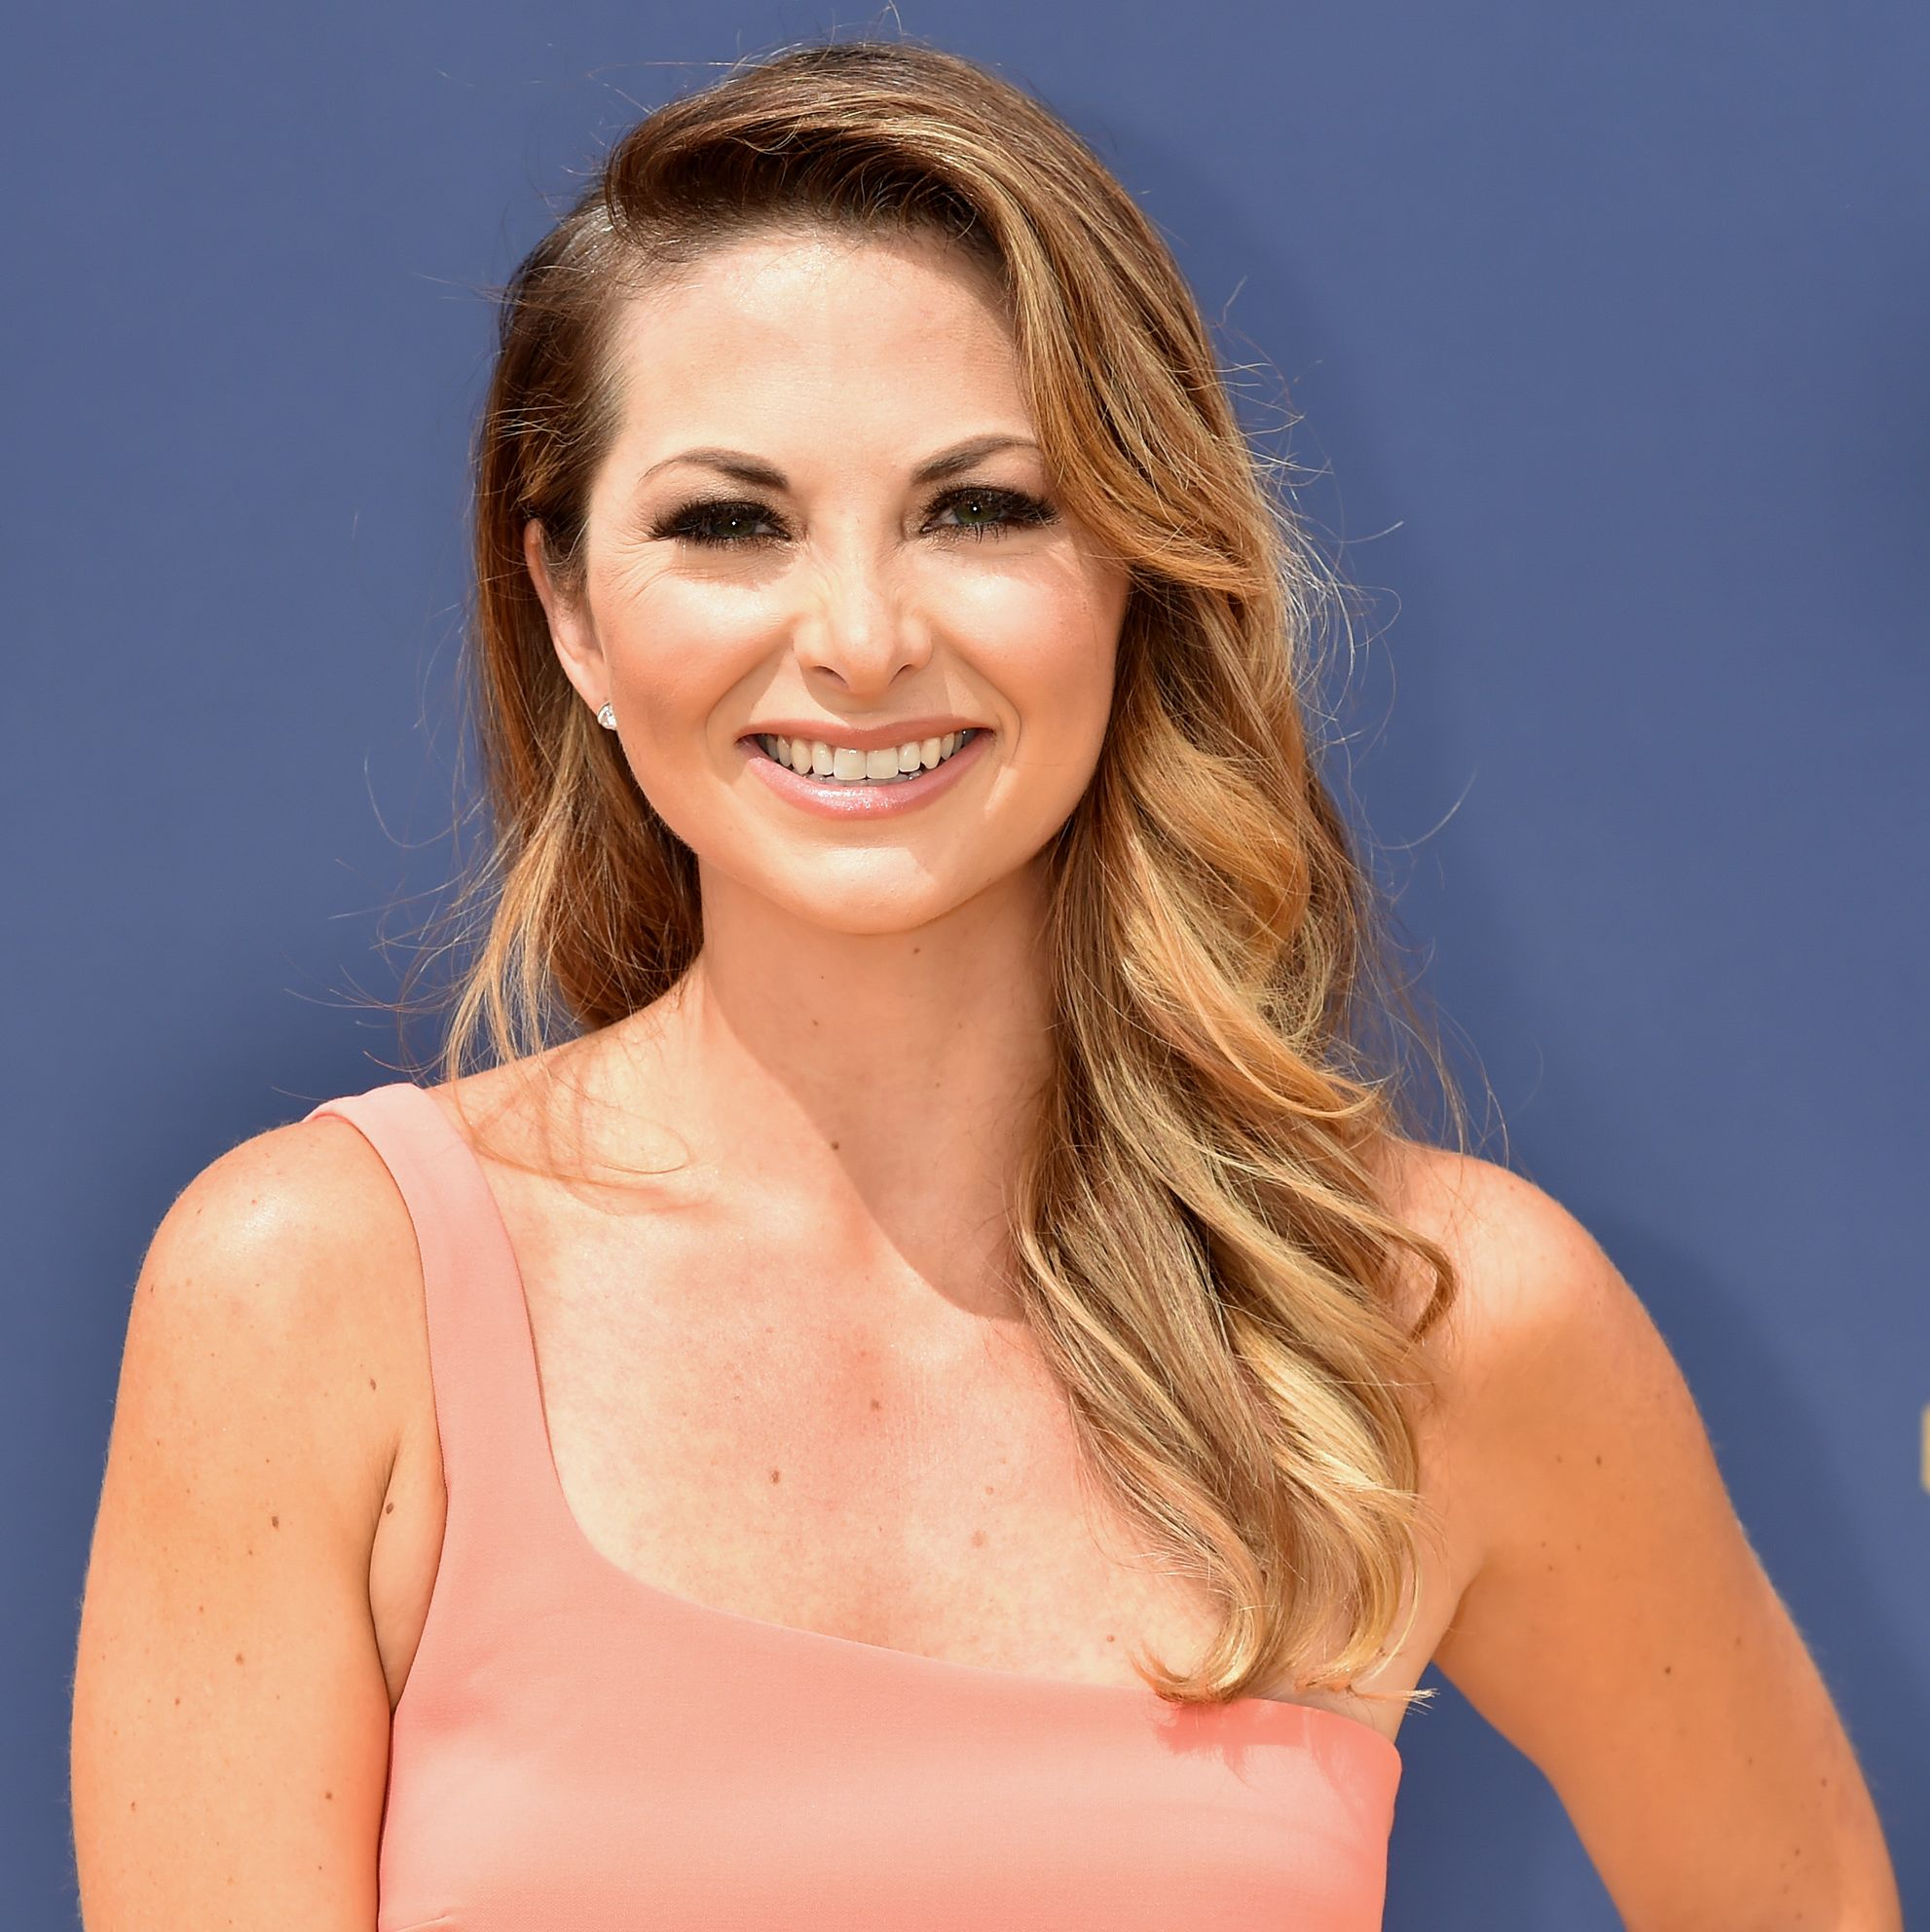 Who Is Chris Harrison's Girlfriend, Lauren Zima? She's Also In Bachelor Nation